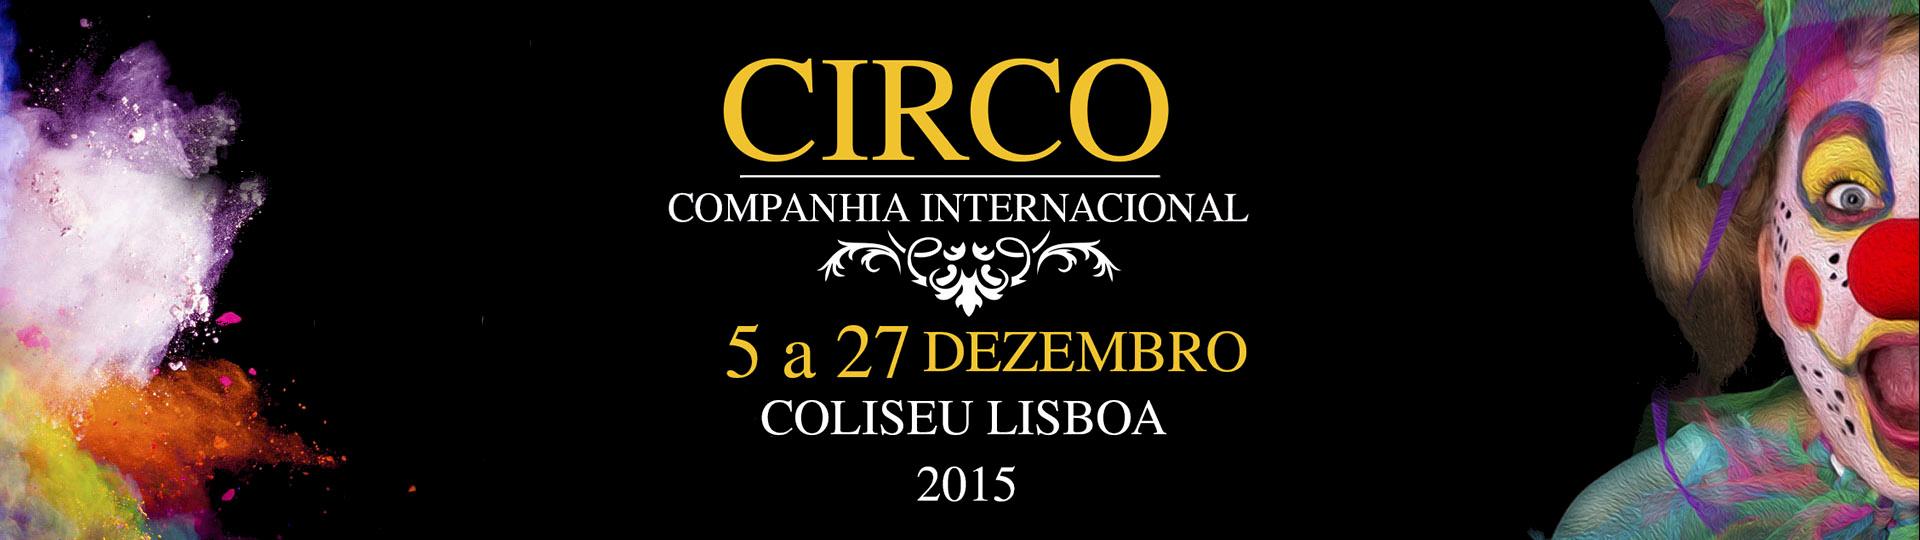 Circo Natal 2015